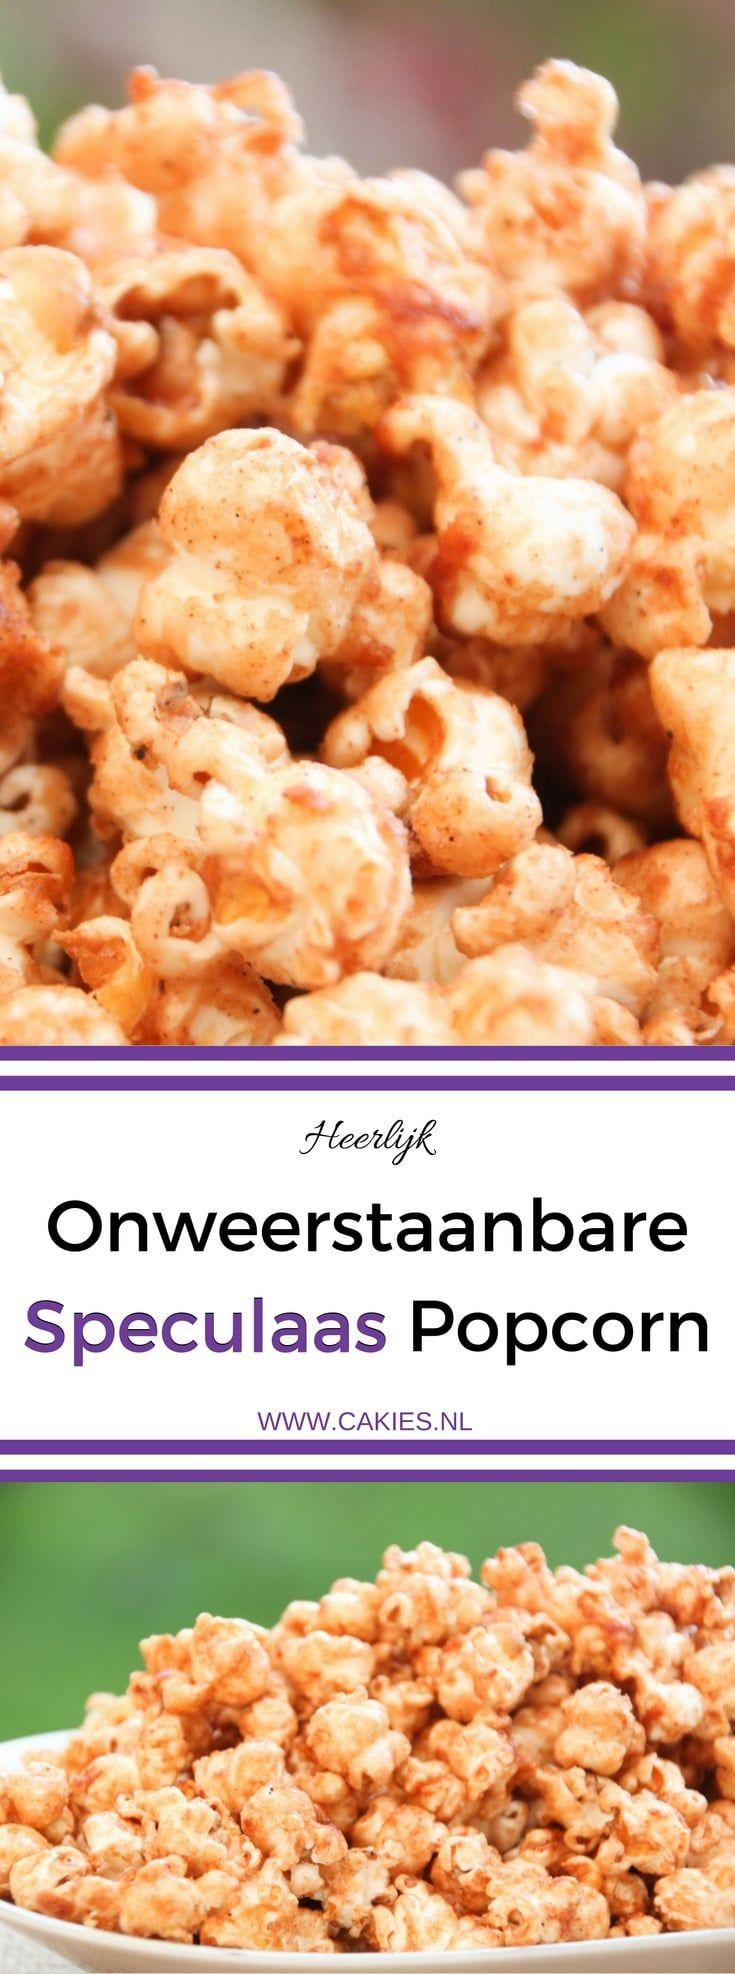 Onweerstaanbare Speculaas Popcorn (Recept)